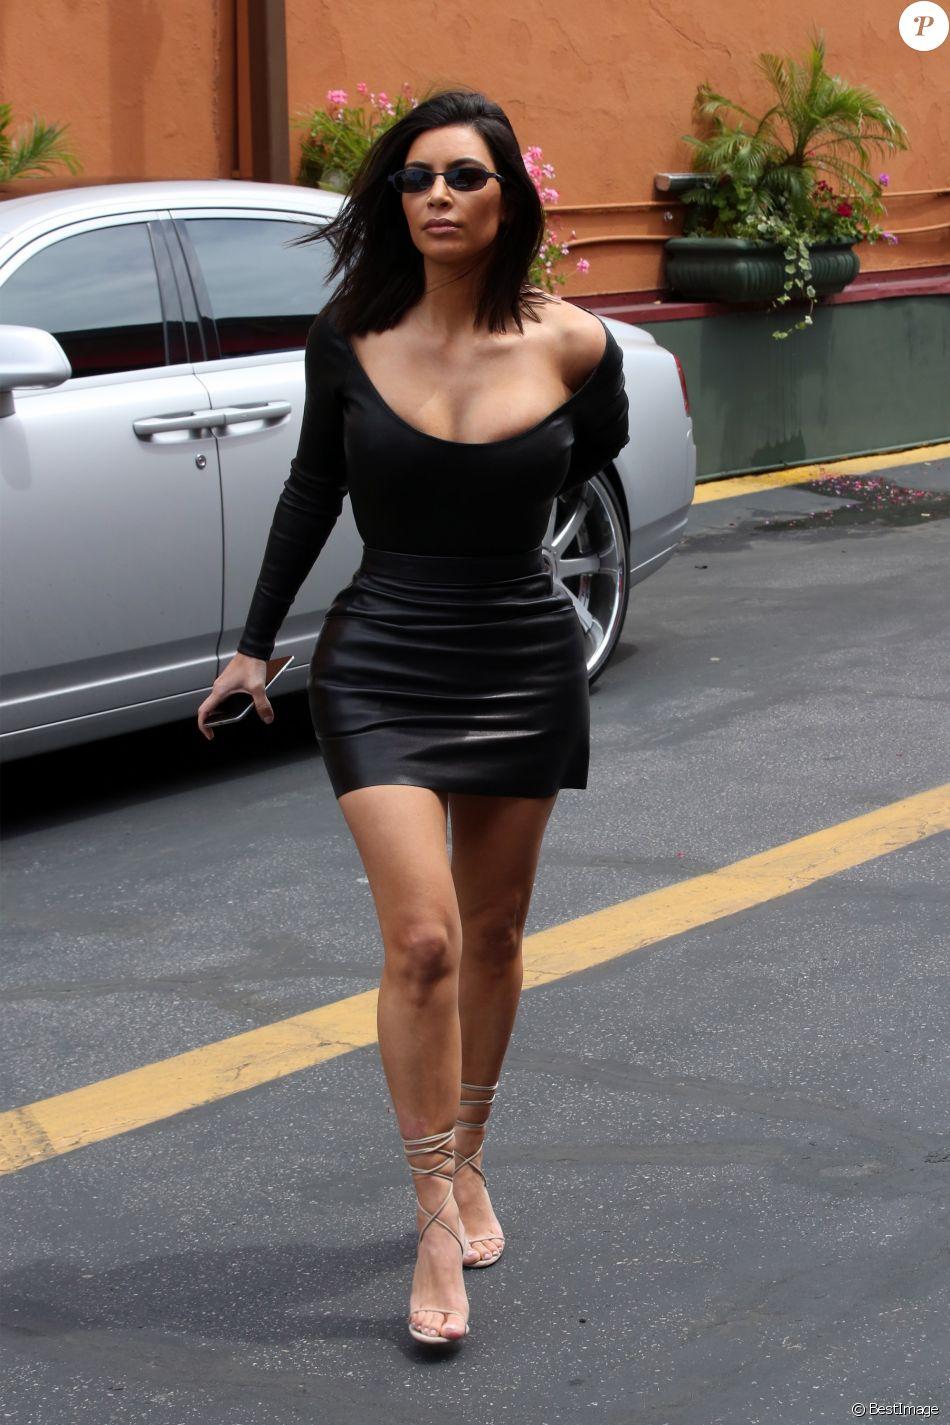 Kim kardashian sex tape full video online in Australia